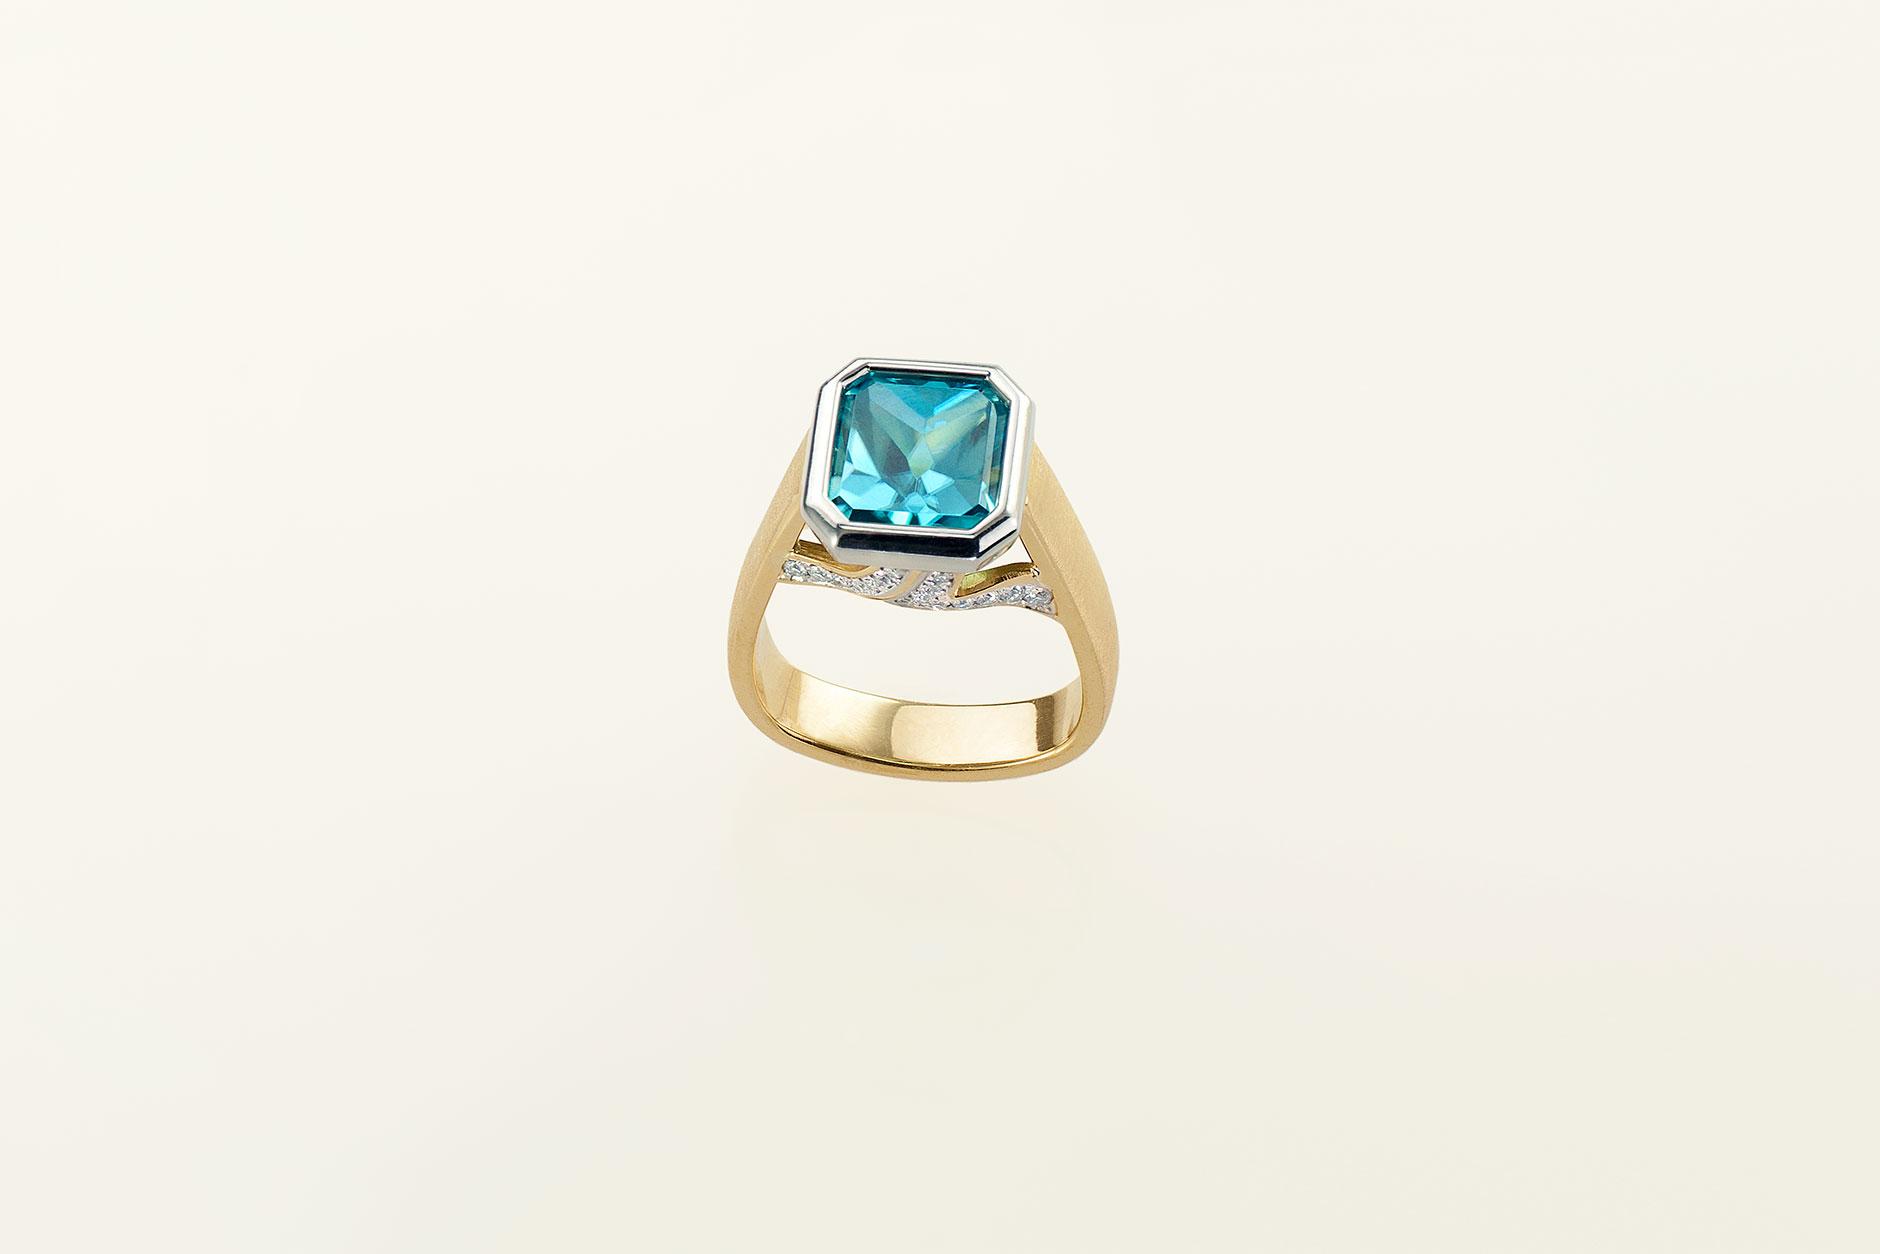 Handmade Custom 18k Platinum Blue Zircon Engagement Ring w Diamond Ribbons - NEWA Goldsmith